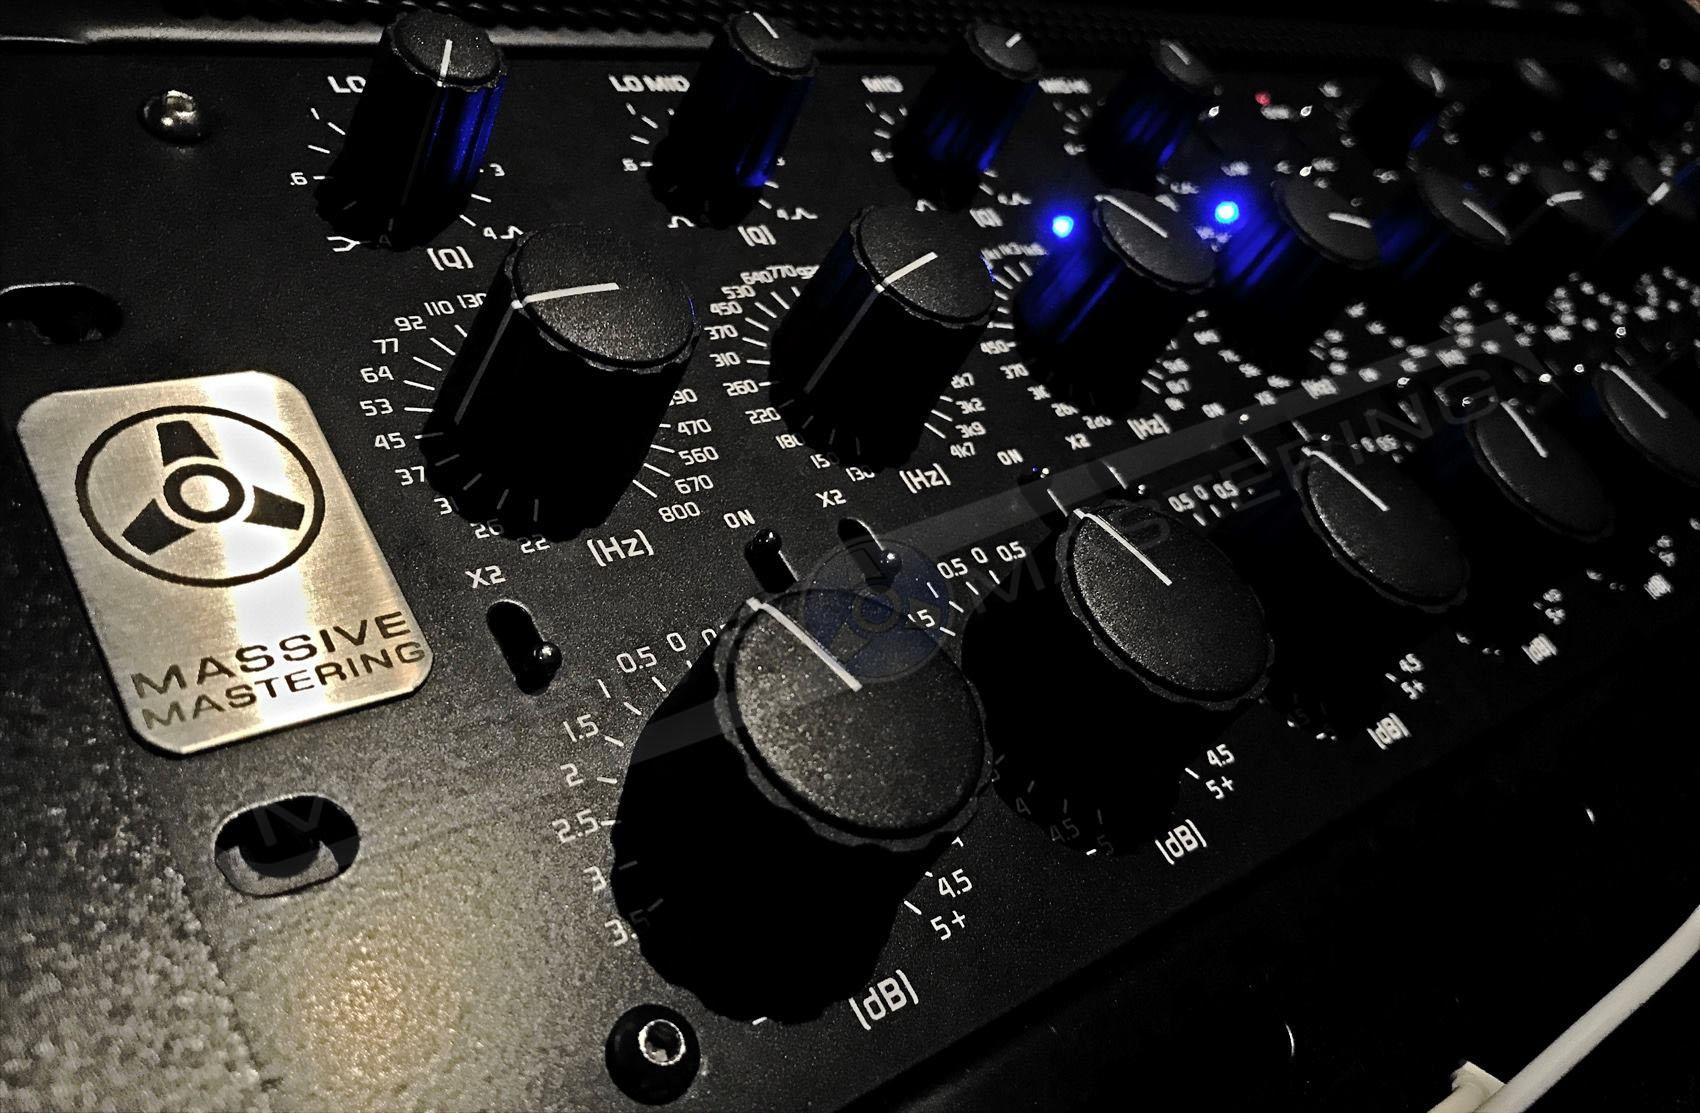 MASSIVE Mastering - http://www.massivemastering.com (@massivemastering) Cover Image